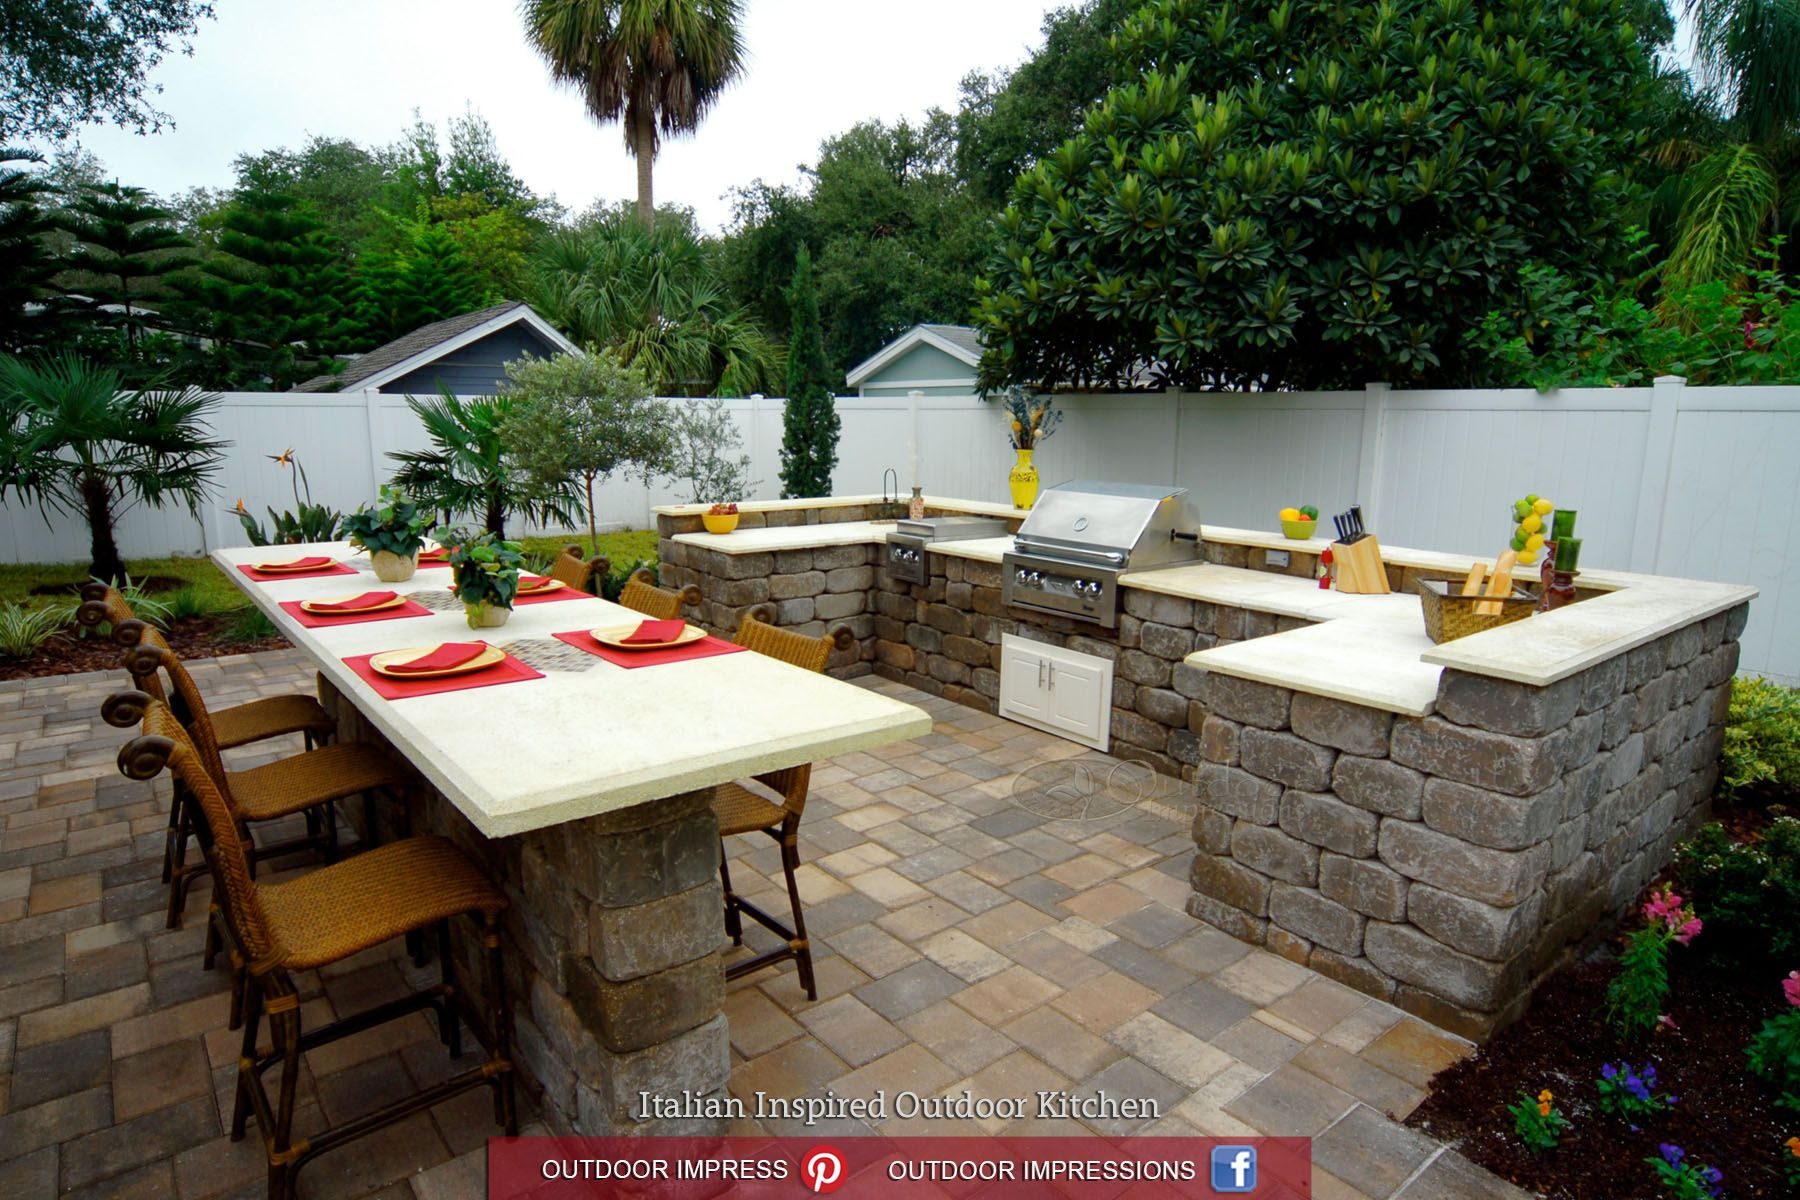 Yard Crashers Outdoor Impressions Tampa Fl Riverview Fl Outdoor Kitchen Outdoor Kitchen Countertops Yard Crashers